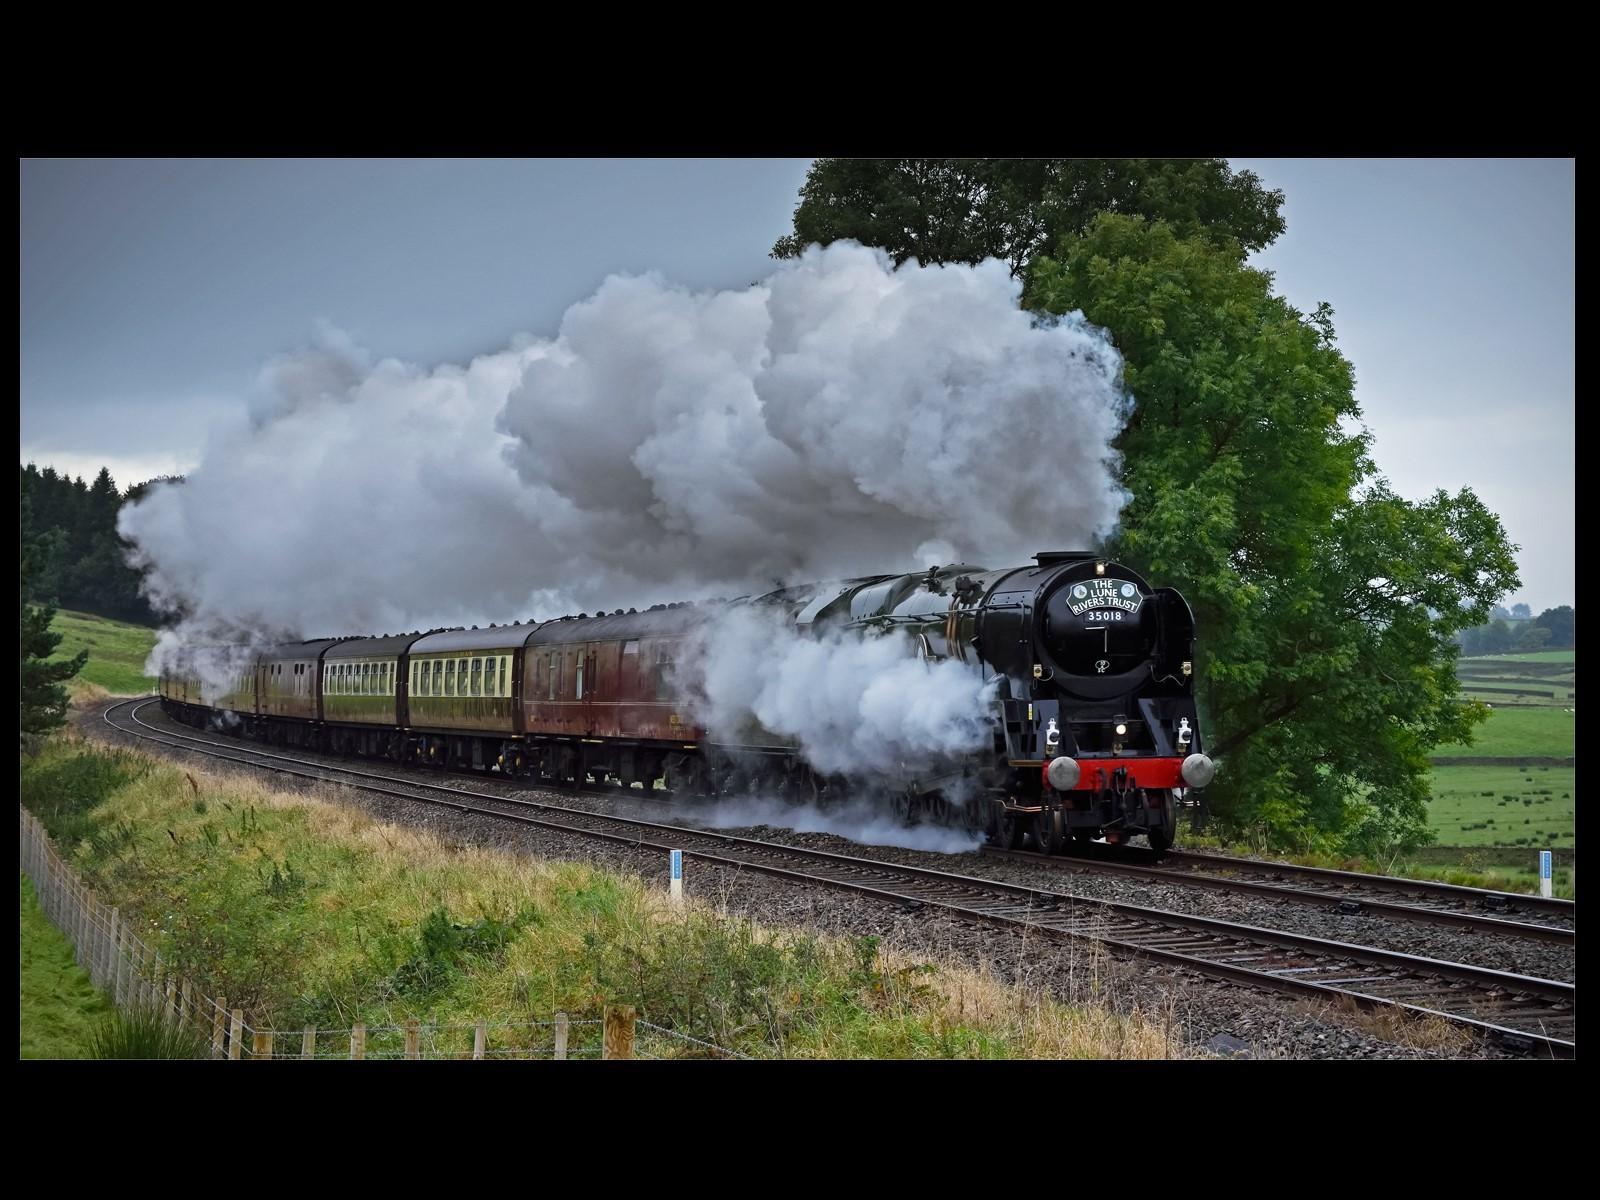 Leaking British India Line at Eldroth